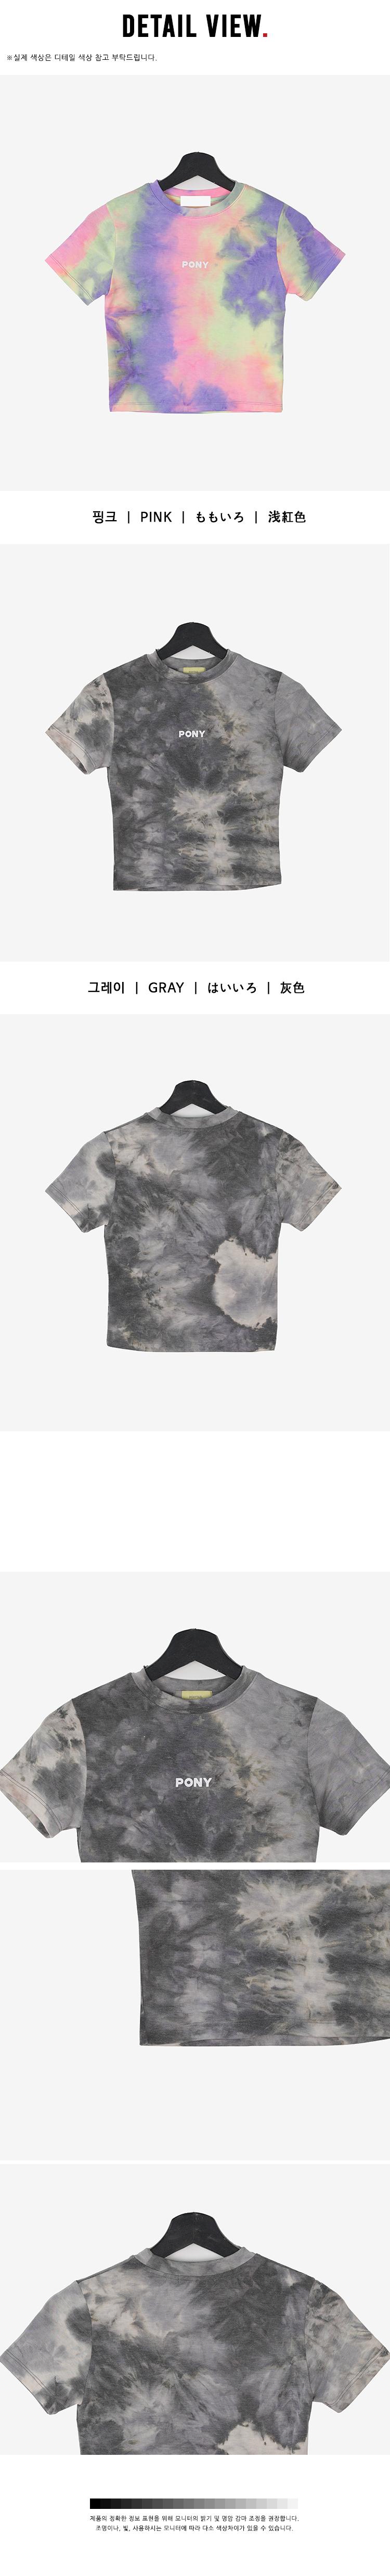 ponyac print cropped short sleeve T-shirt